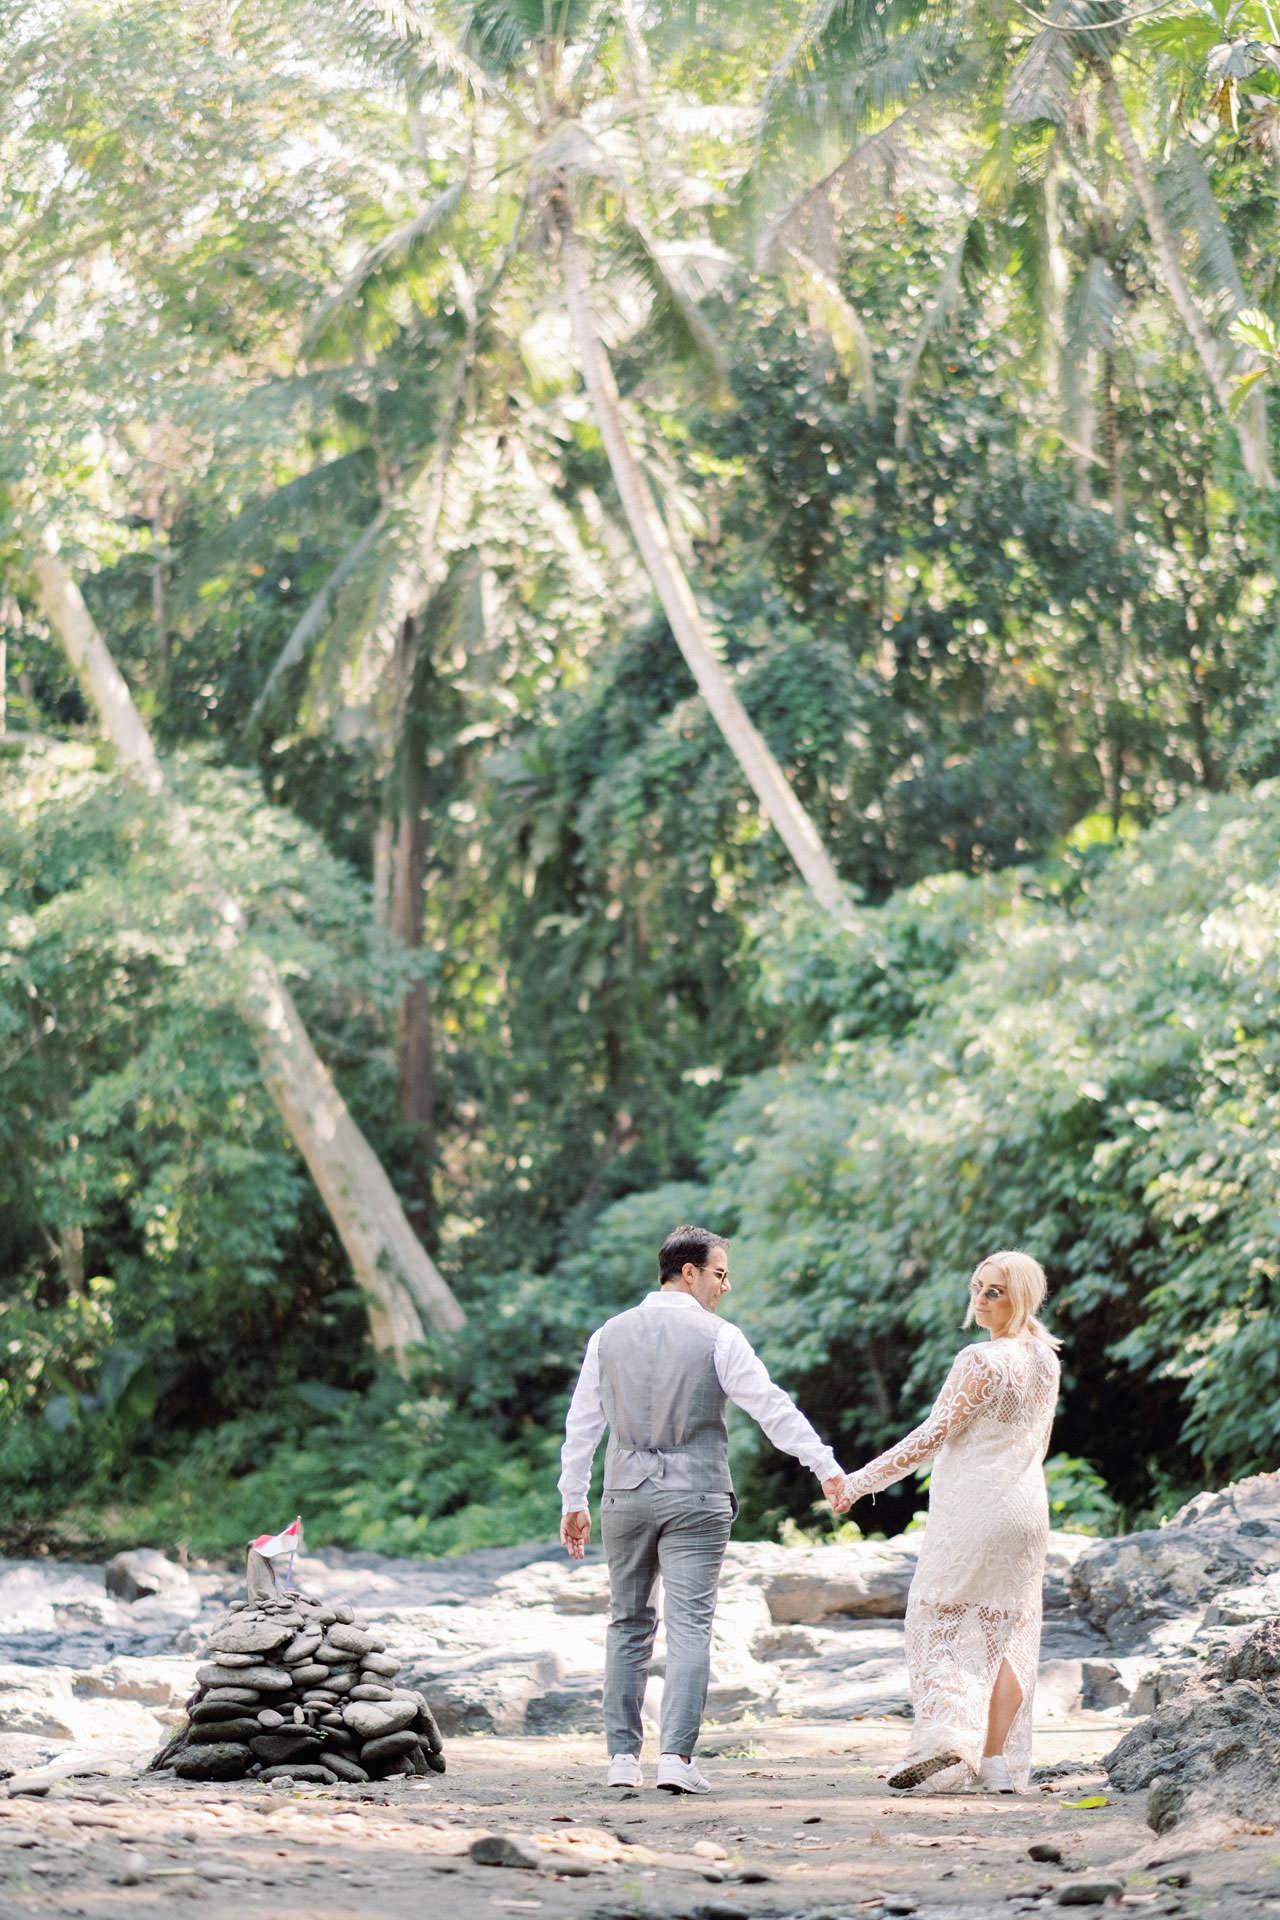 Peaceful Bali Honeymoon Locations 19